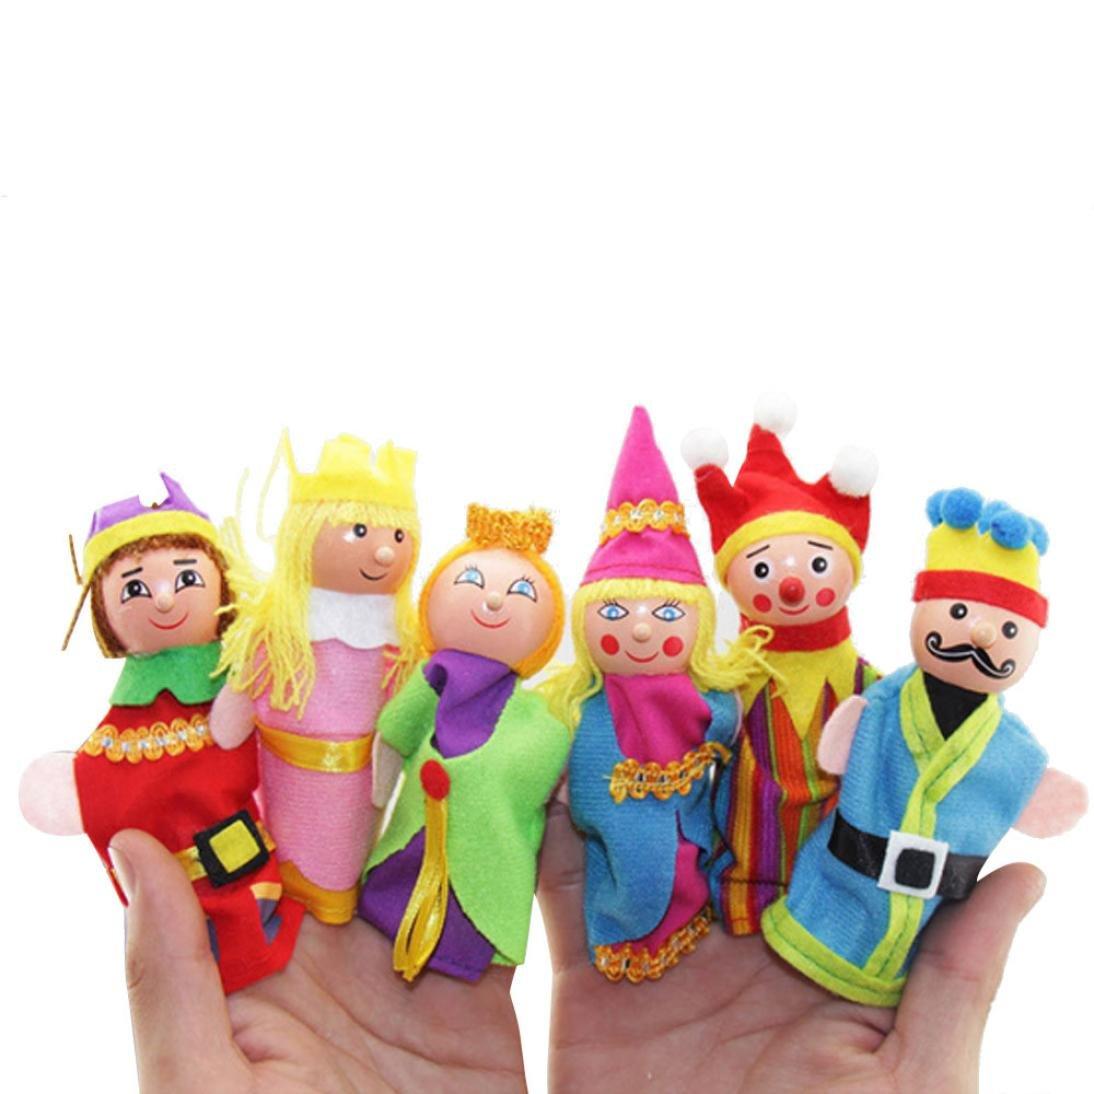 Amazon com: Finger Puppets,Putars 6 Pcs Multi-function